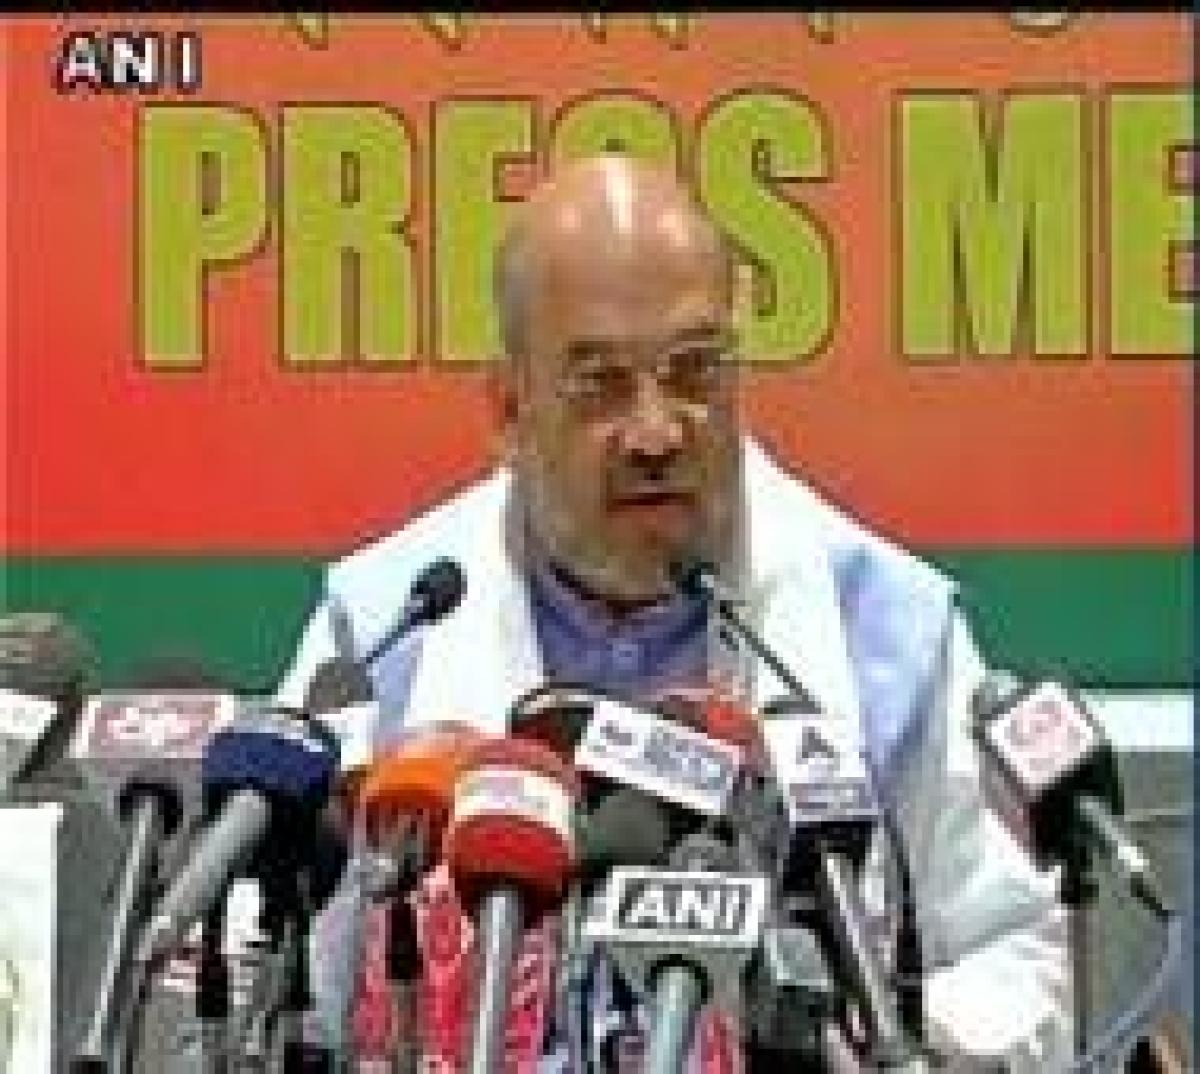 Tamil Nadu needs a BJP government: Amit Shah